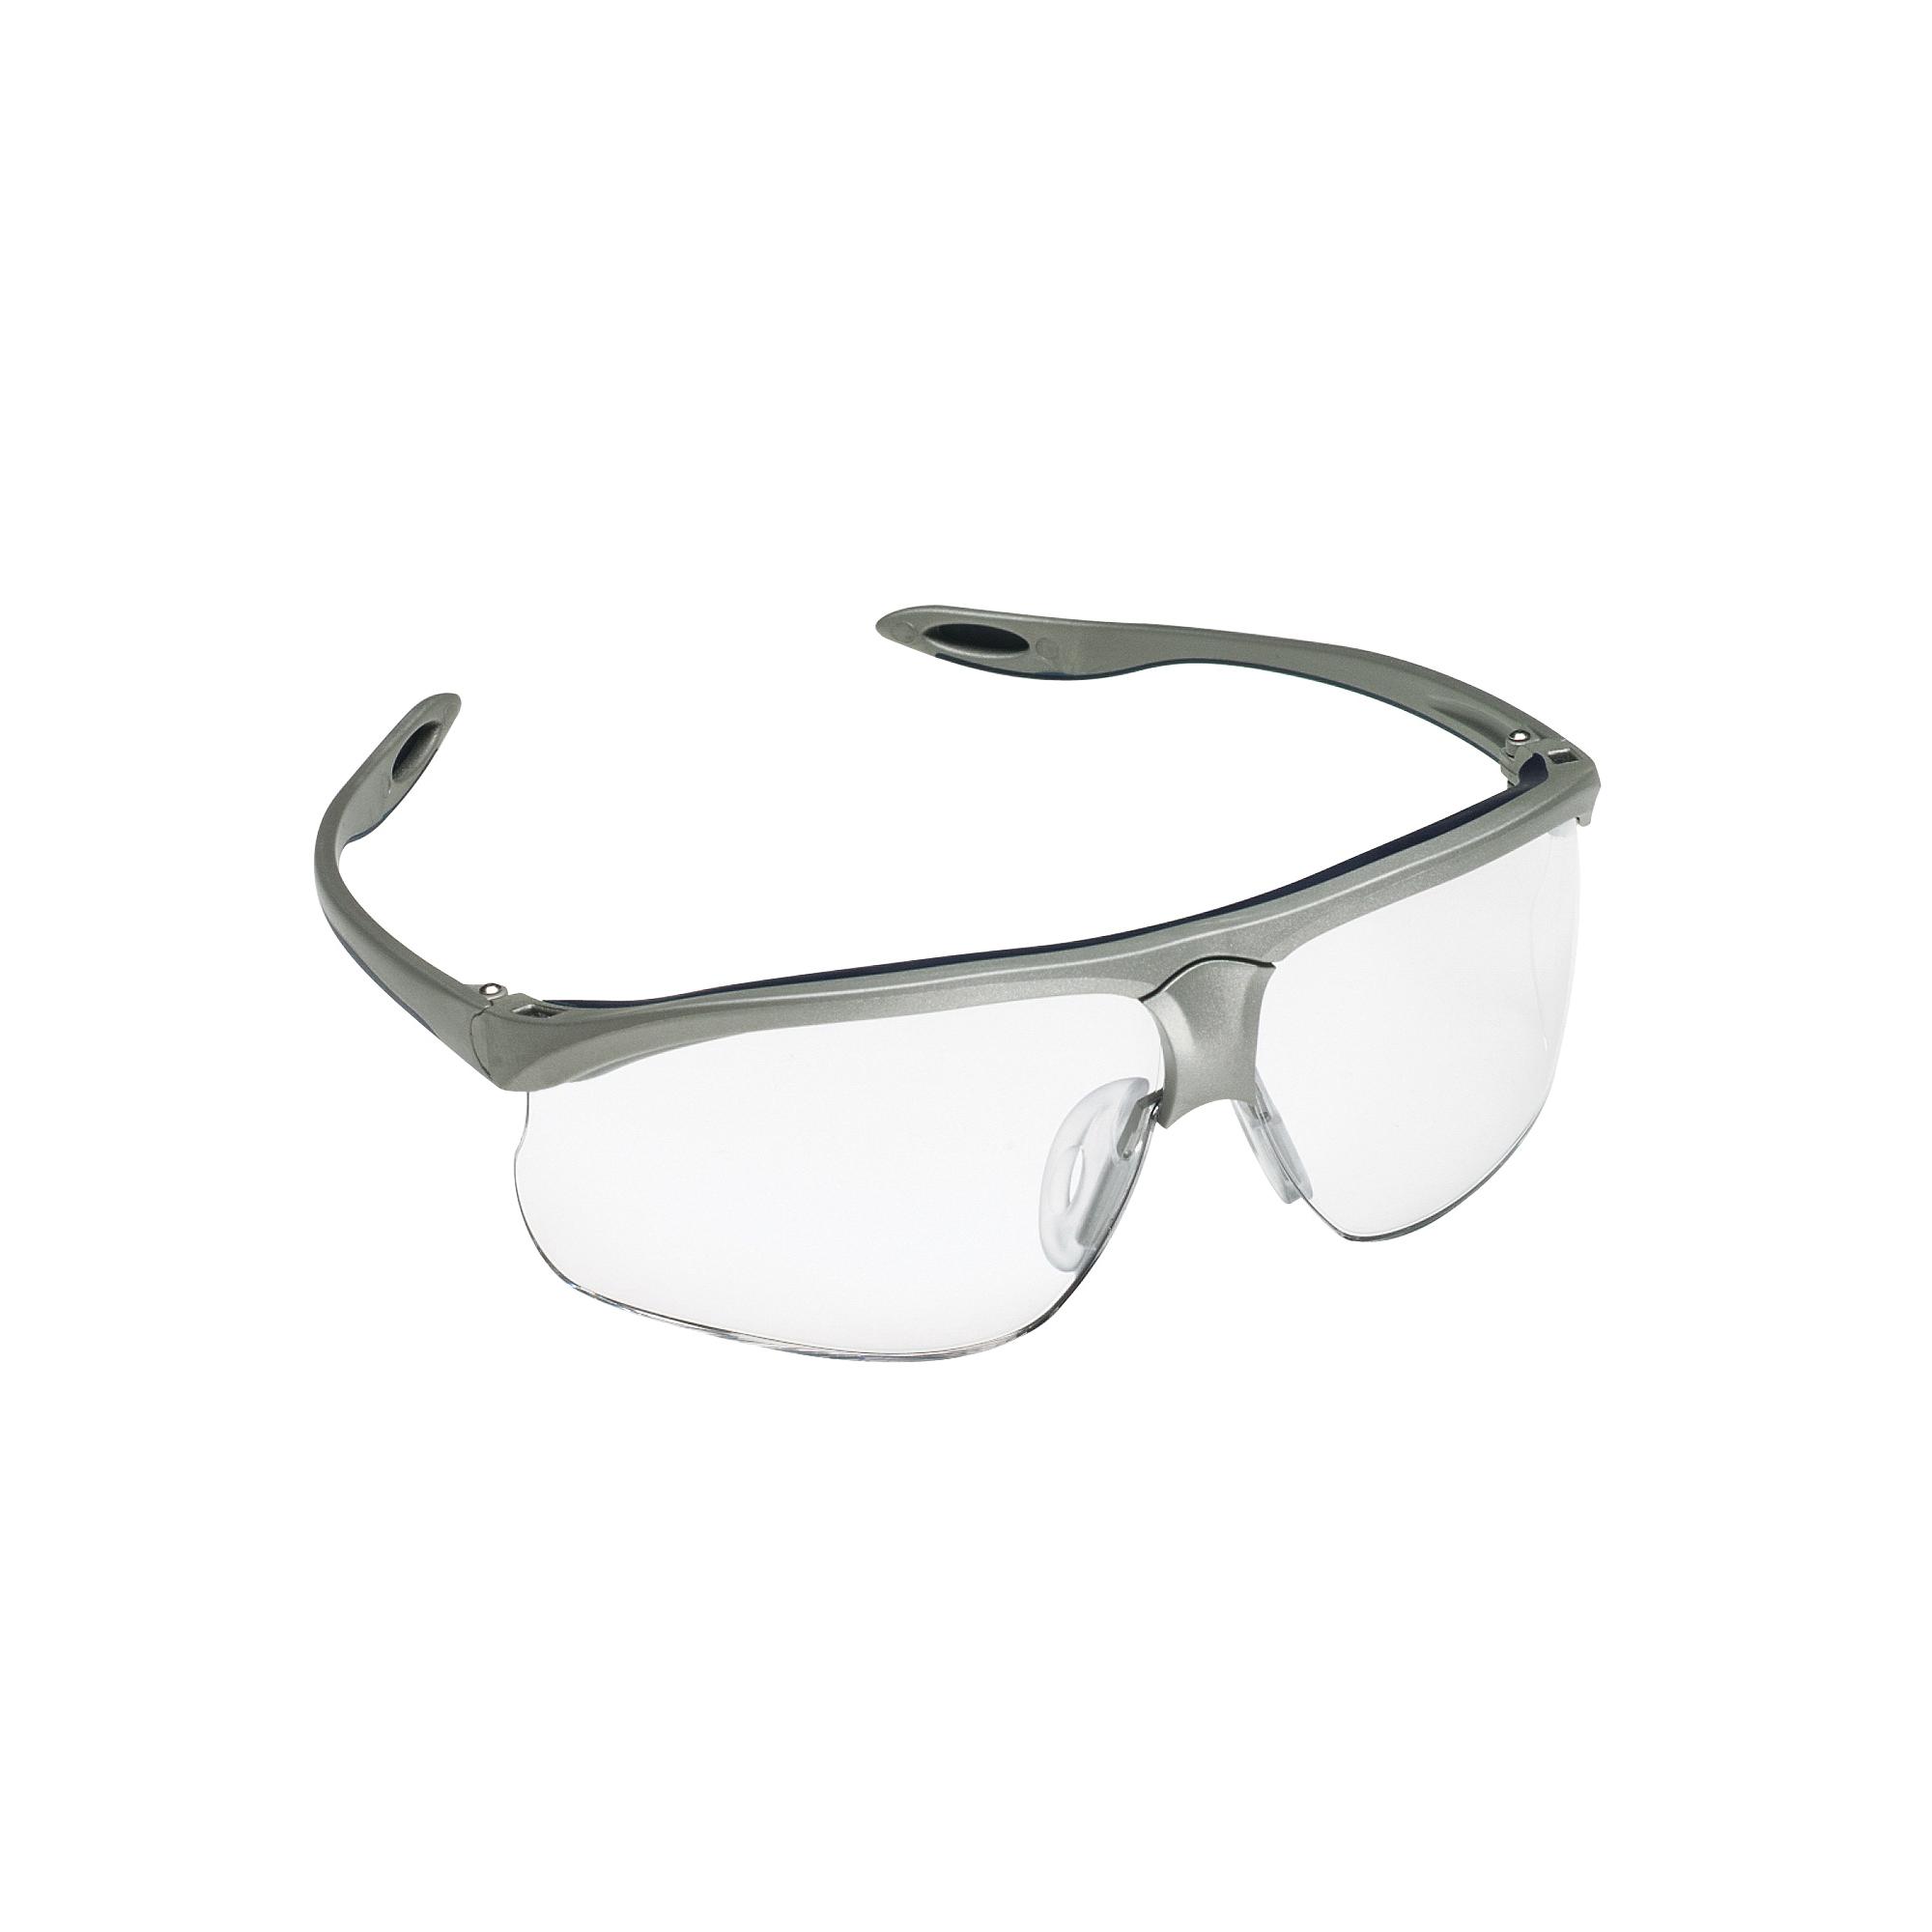 3M™ Maxim™ 078371-62245 Sport Value Range Protective Glasses, Anti-Fog/Anti-Scratch, Clear Lens, Half Framed Frame, Blue/Silver, Plastic Frame, Polycarbonate Lens, ANSI Z87.1, CSA Z94.3